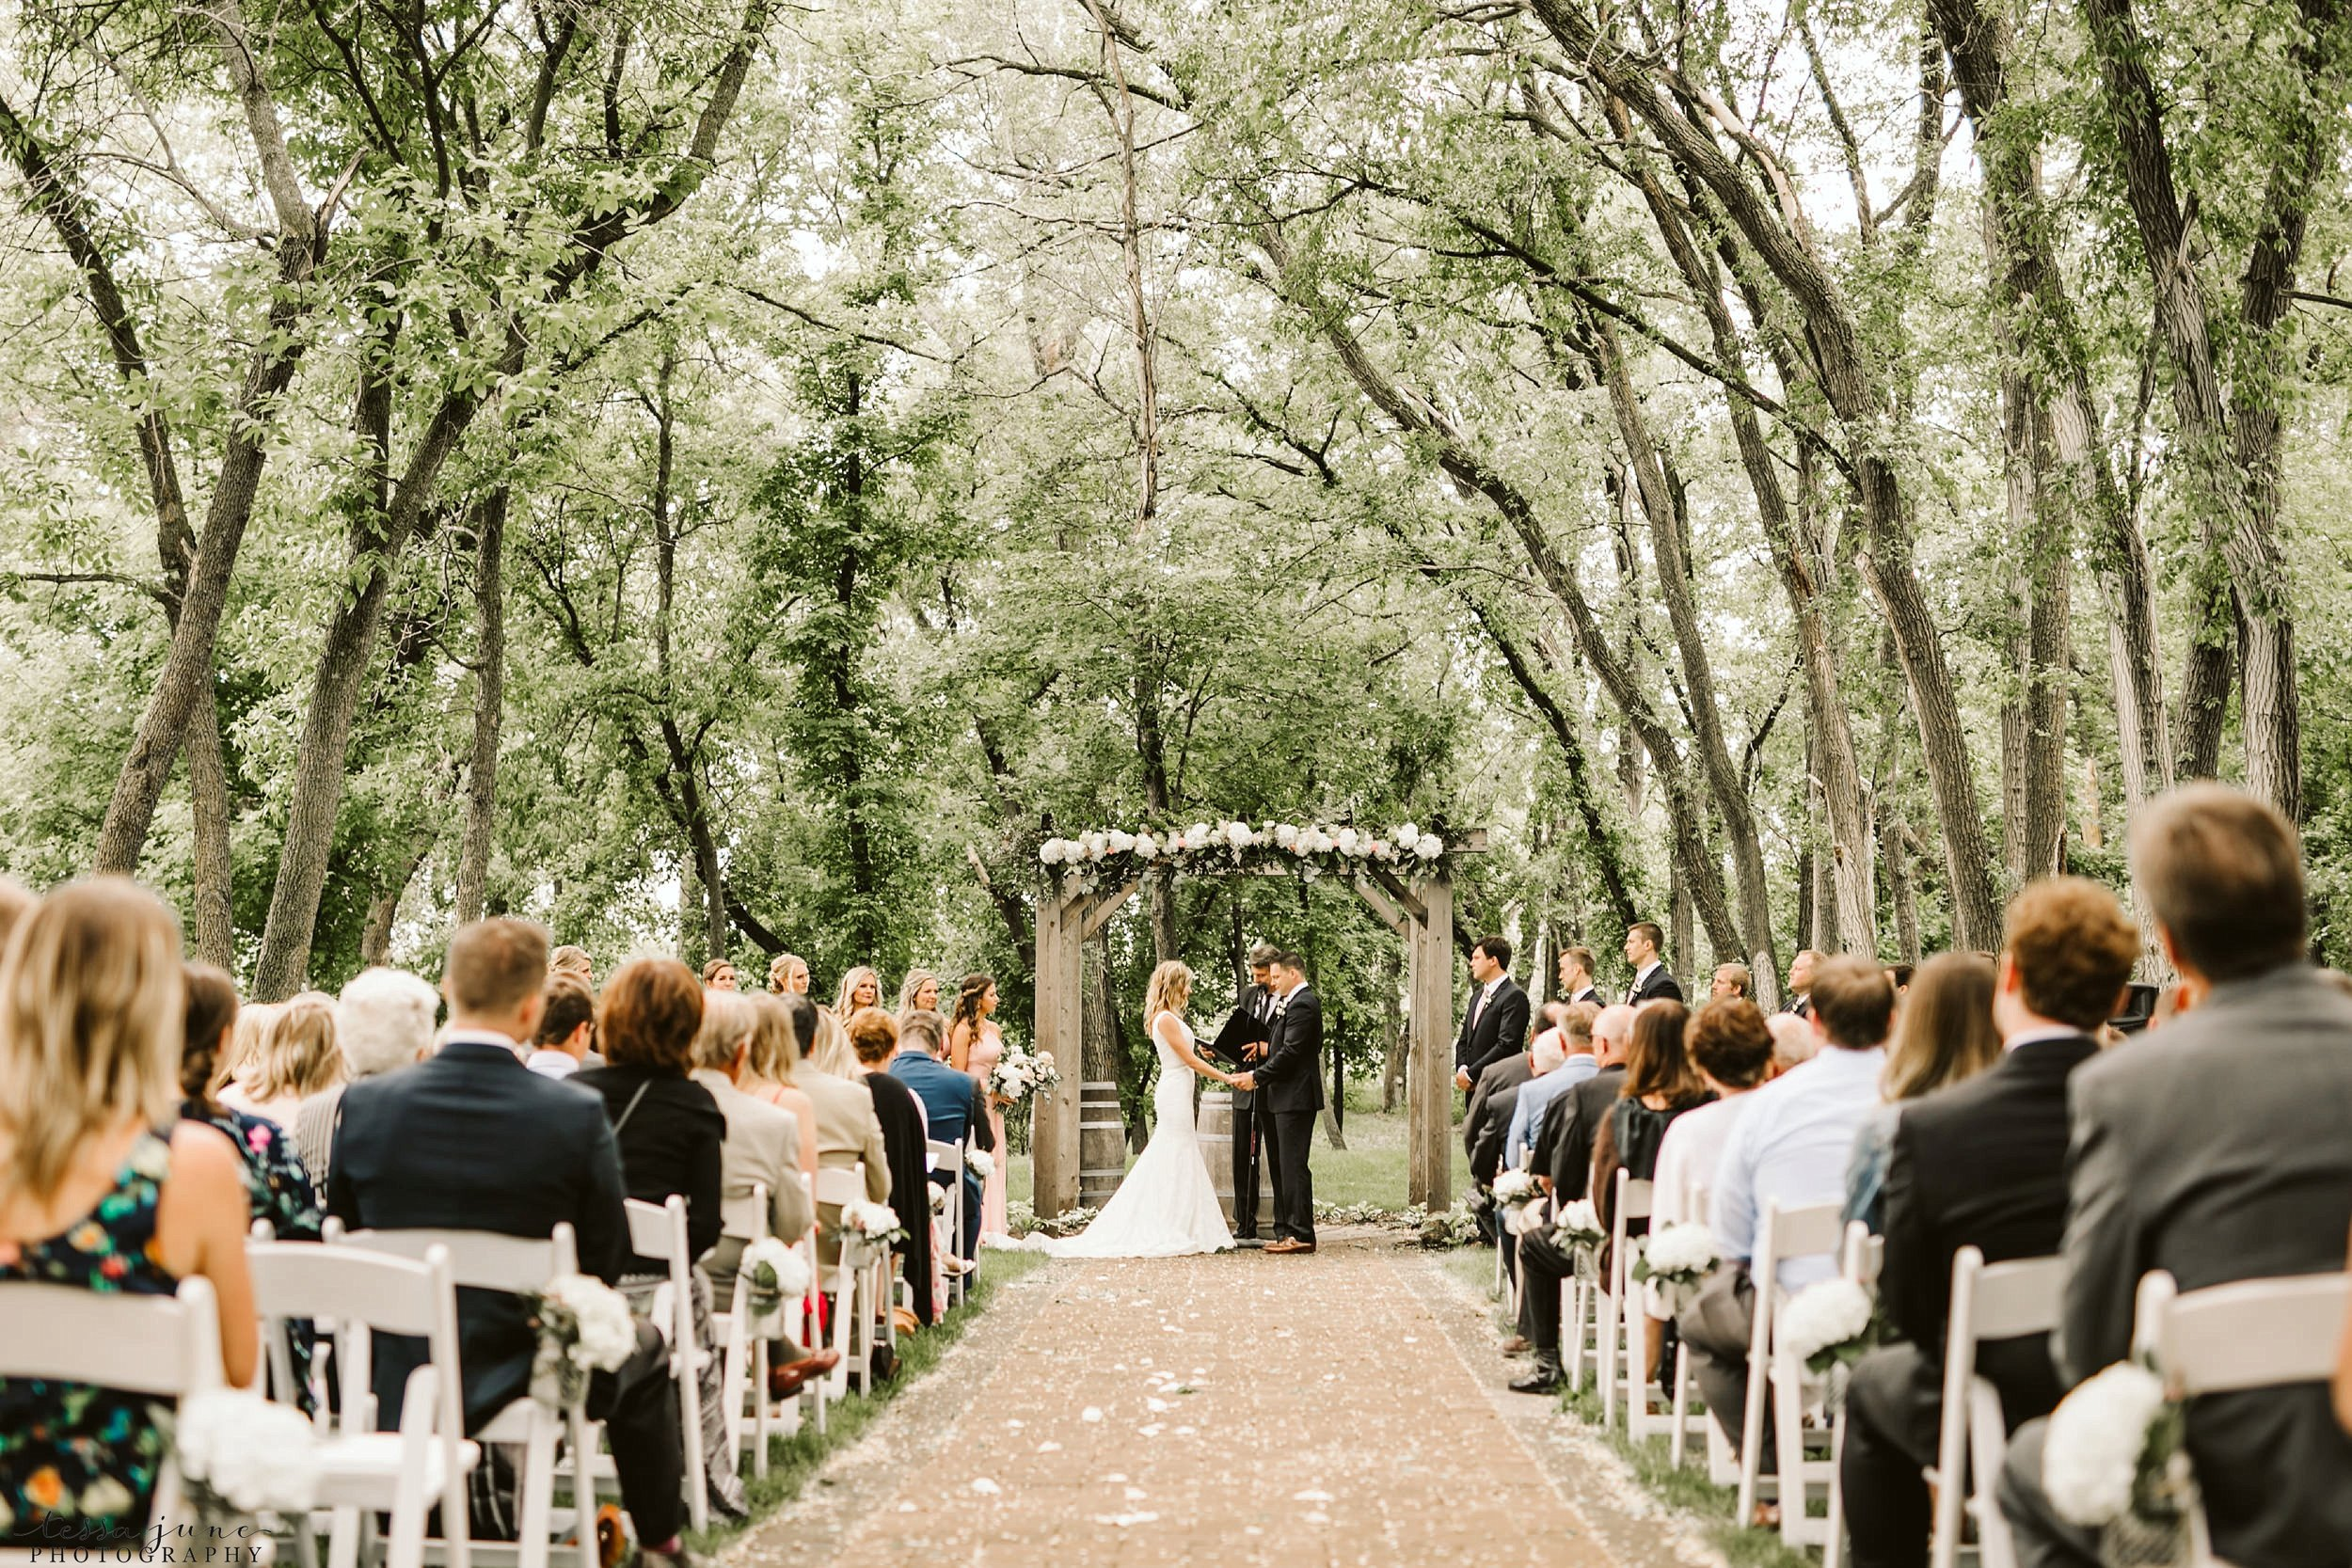 carlos-creek-winery-wedding-summer-pristine-floral-blush-pink-navy-alexandria-minnesota-109.jpg